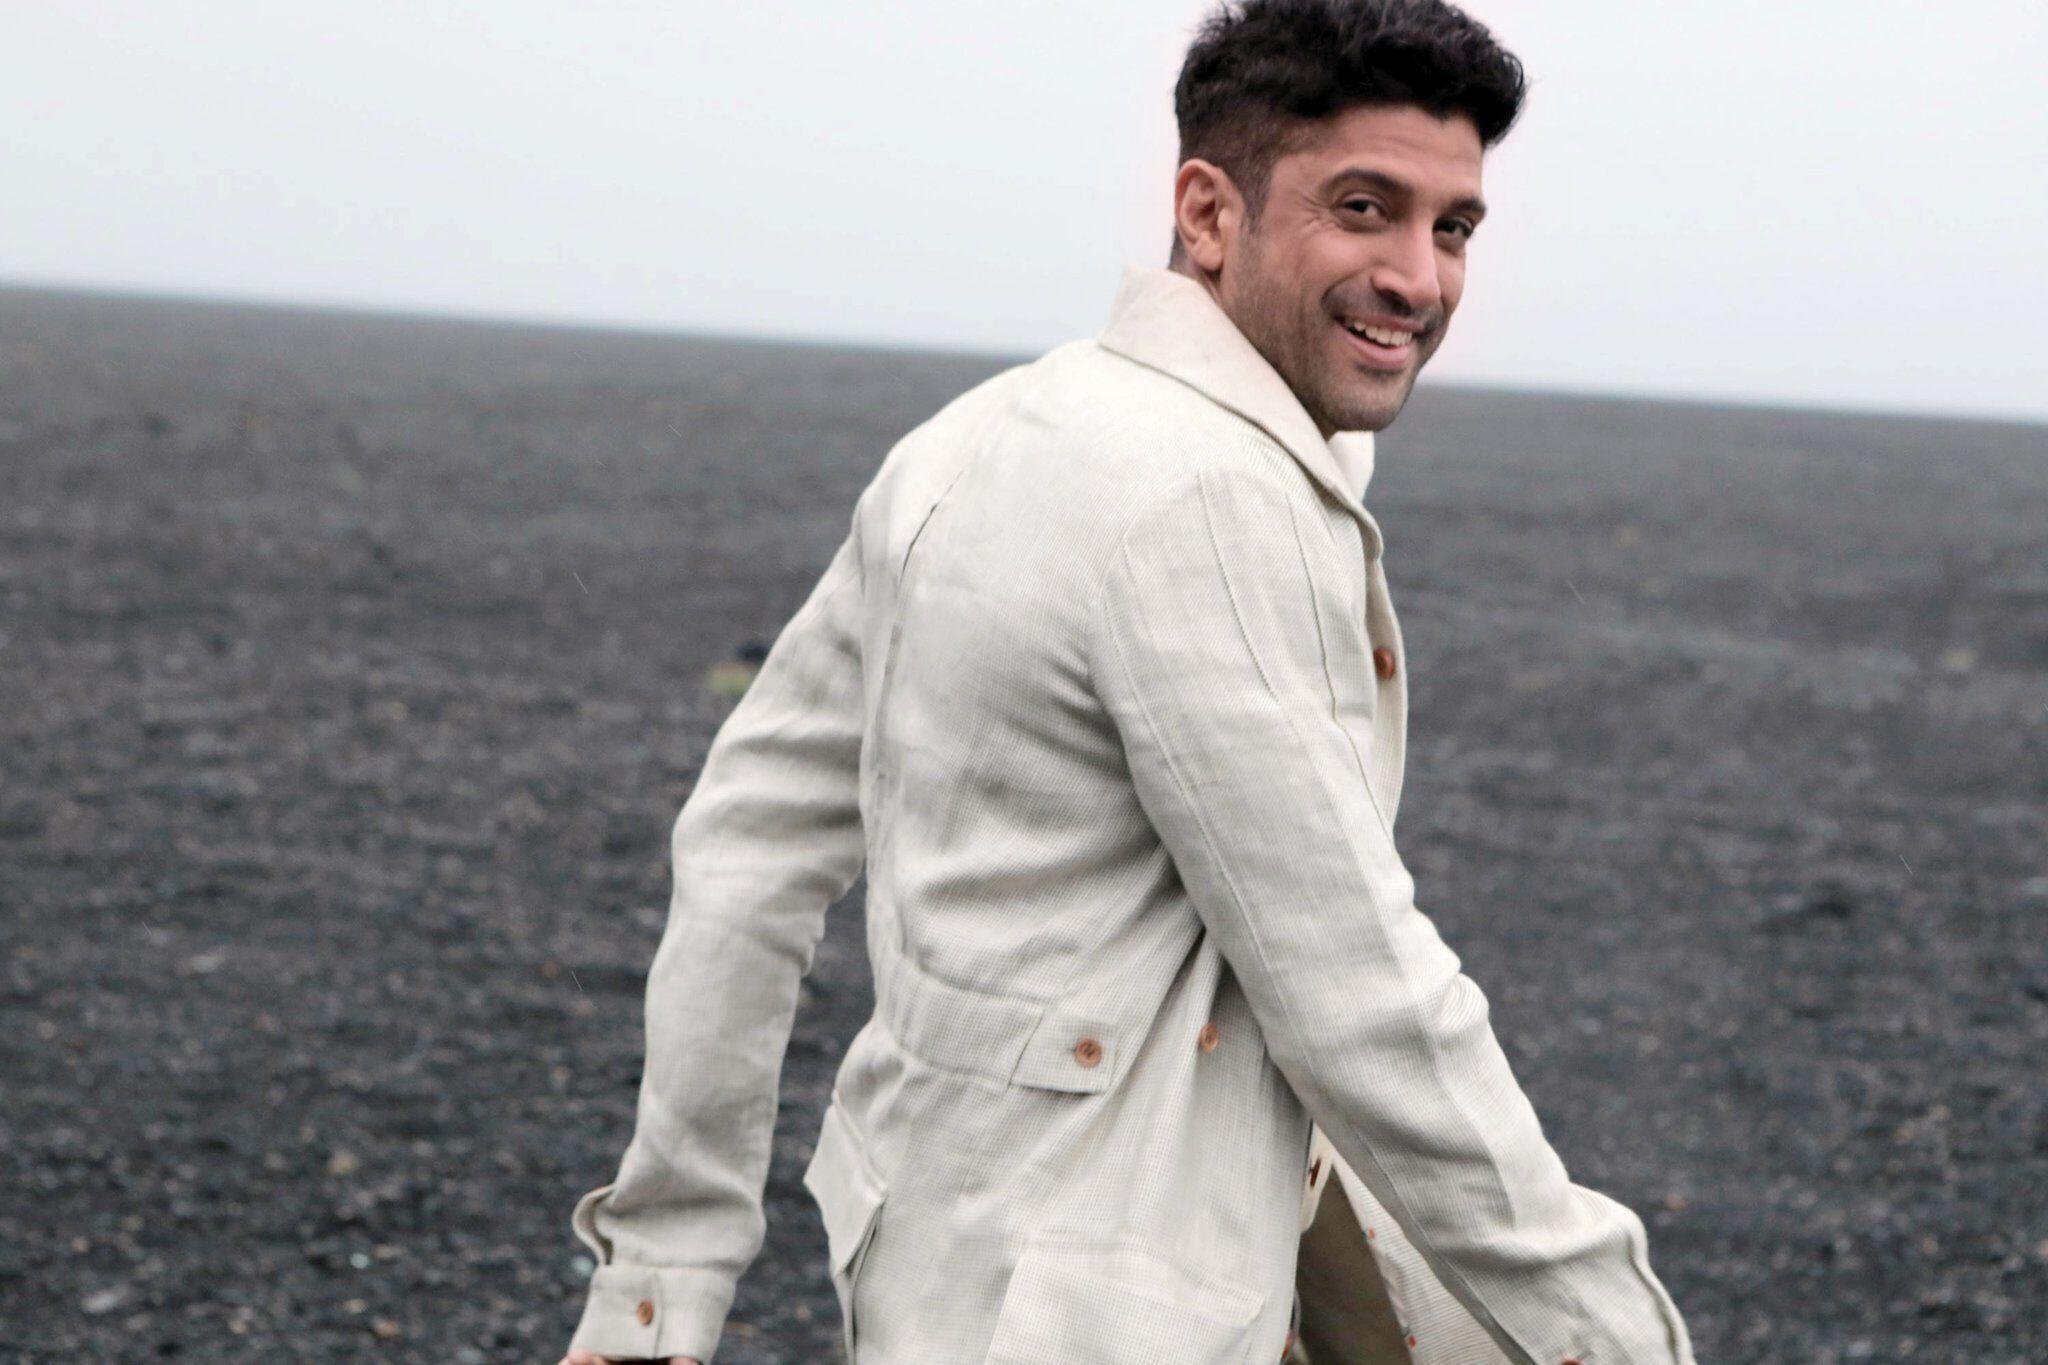 Multitalenta, Inilah 5 Film Inspiratif yang Dibintangi Farhan Akhtar